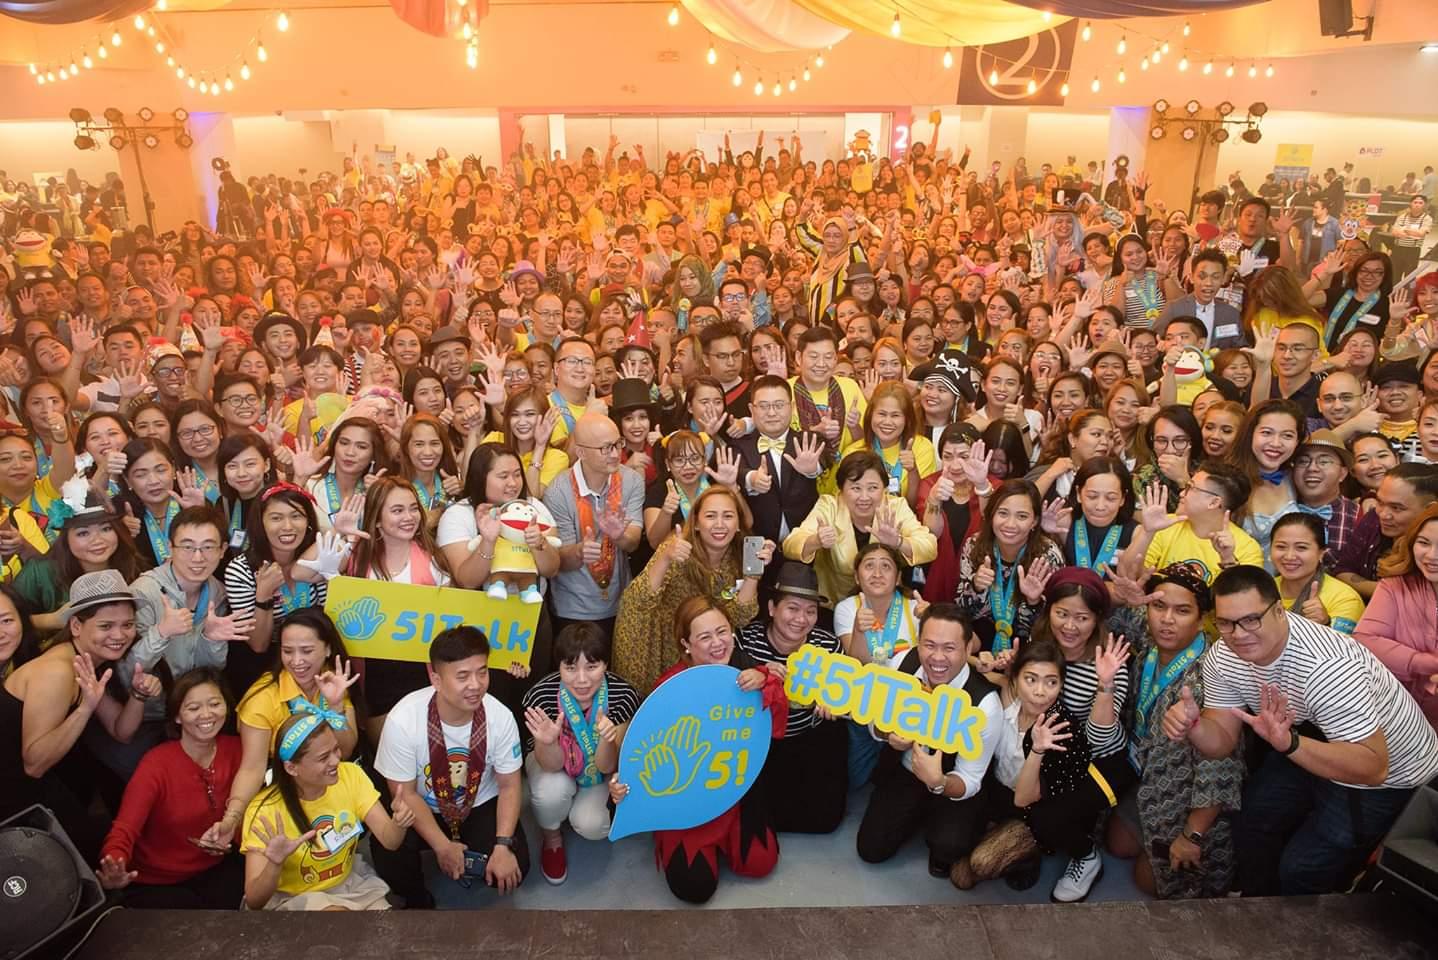 51Talk currently employs 16,000 Filipino teachers